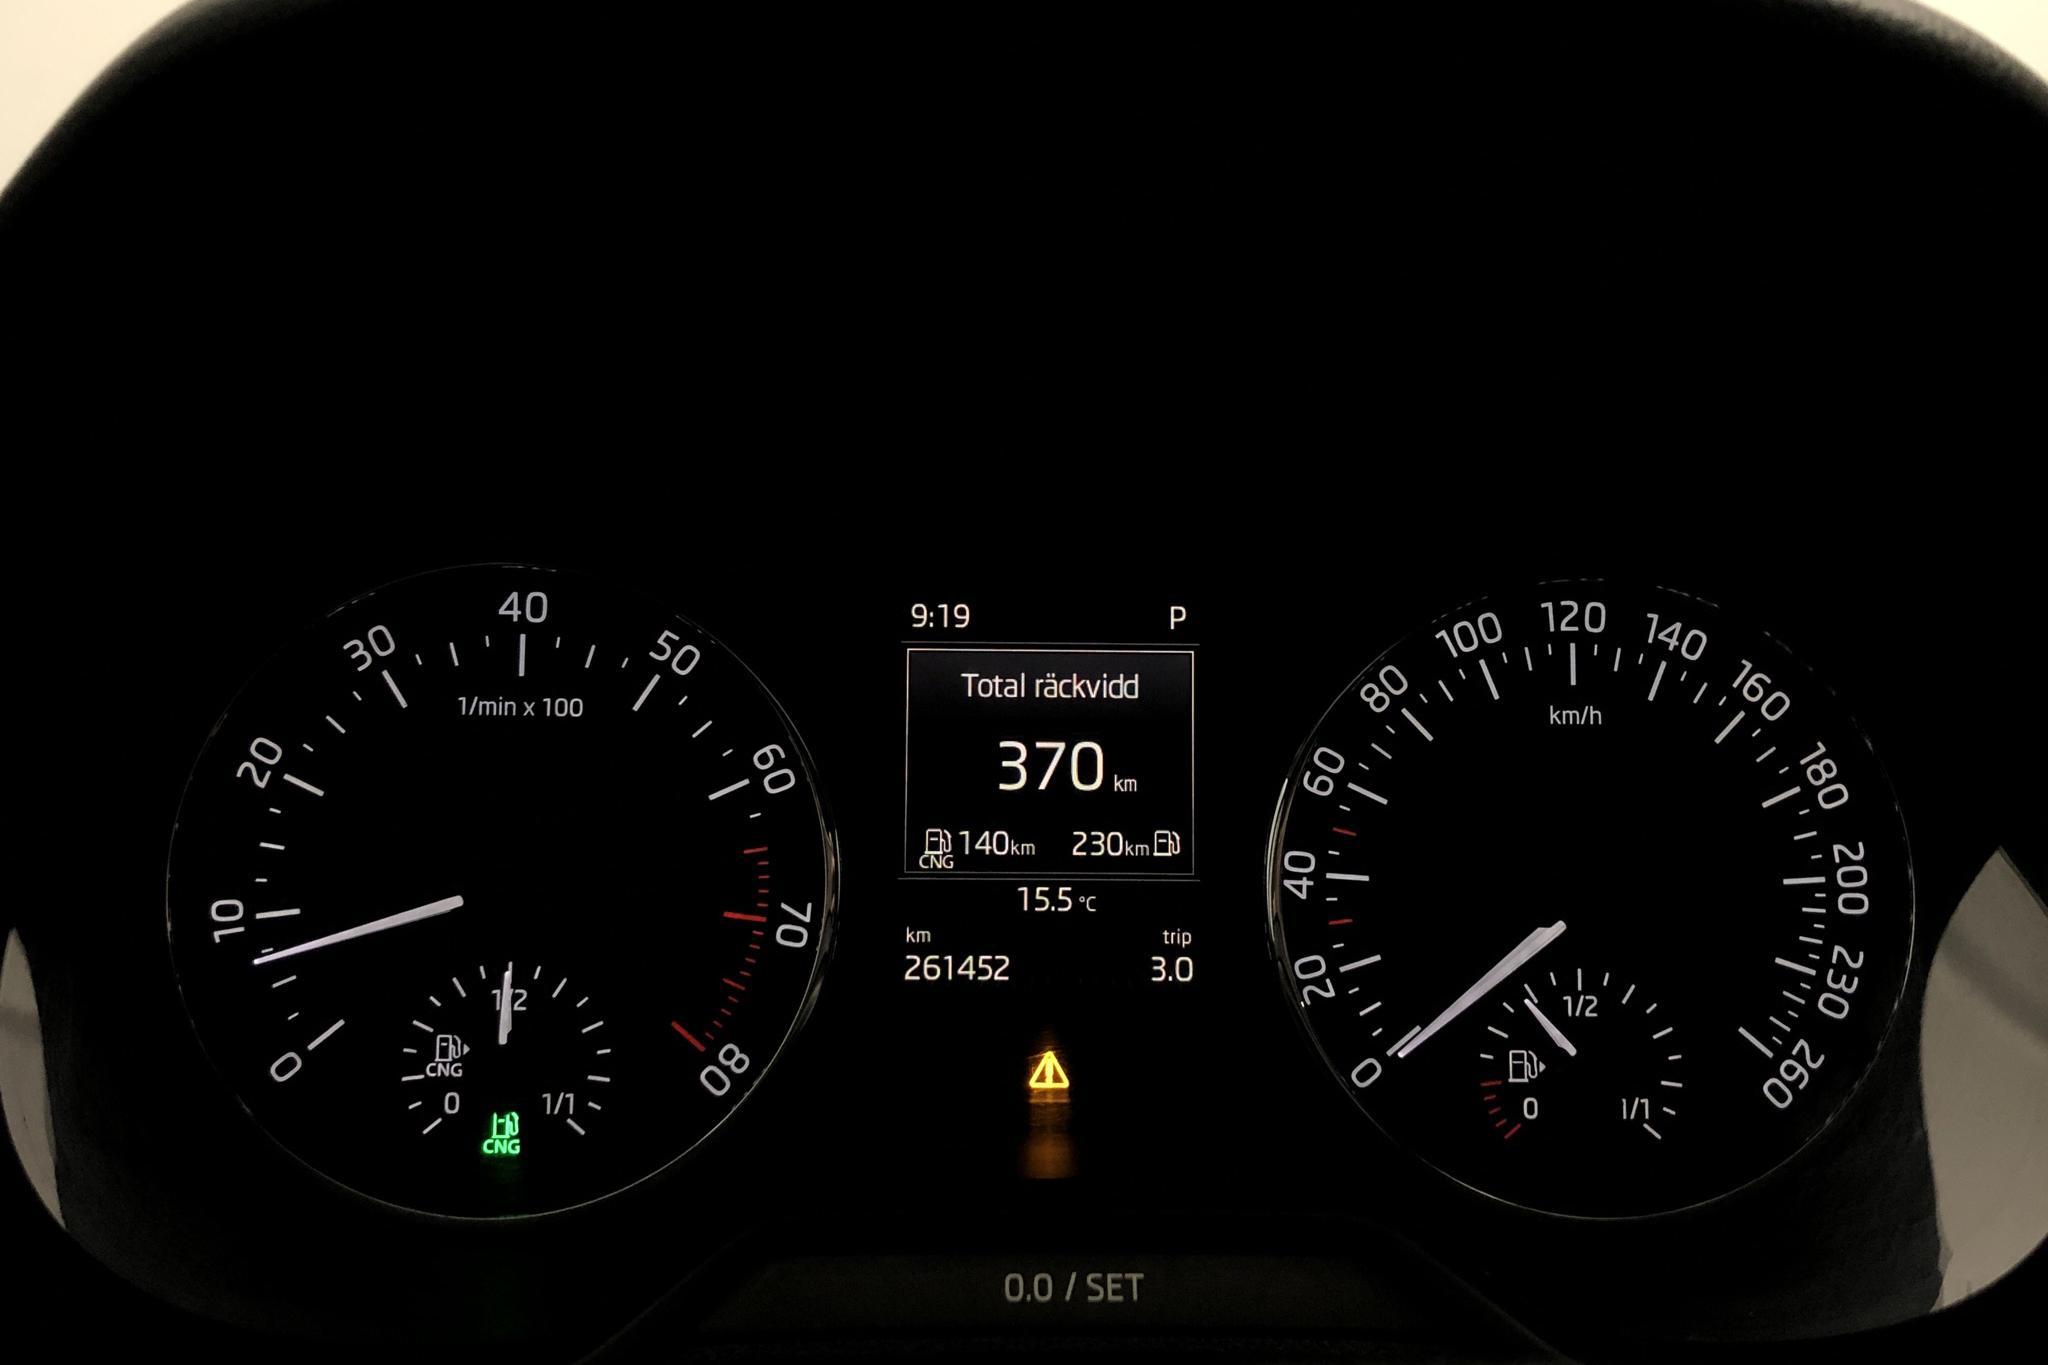 Skoda Octavia III 1.4 TSI G-TEC Combi (110hk) - 261 440 km - Automatic - red - 2017